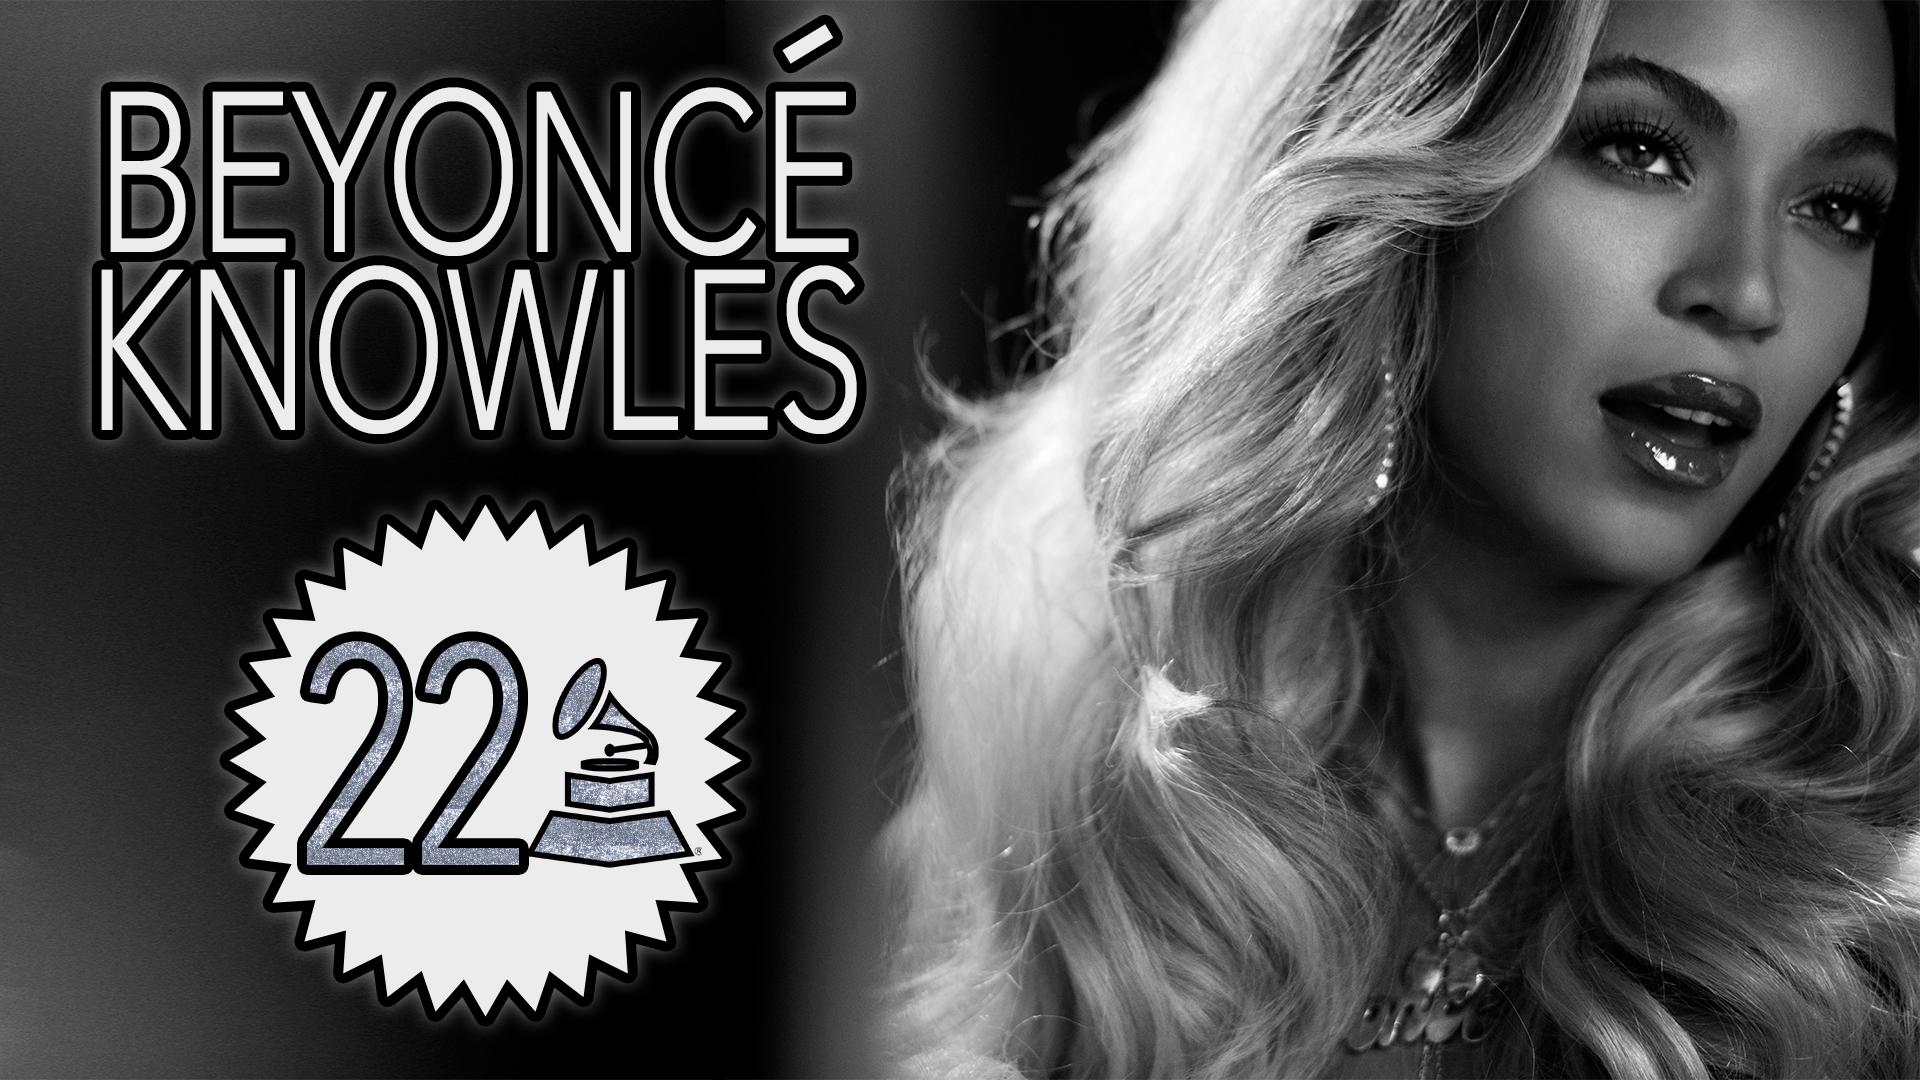 Beyoncé Knowles with 22 GRAMMY Awards